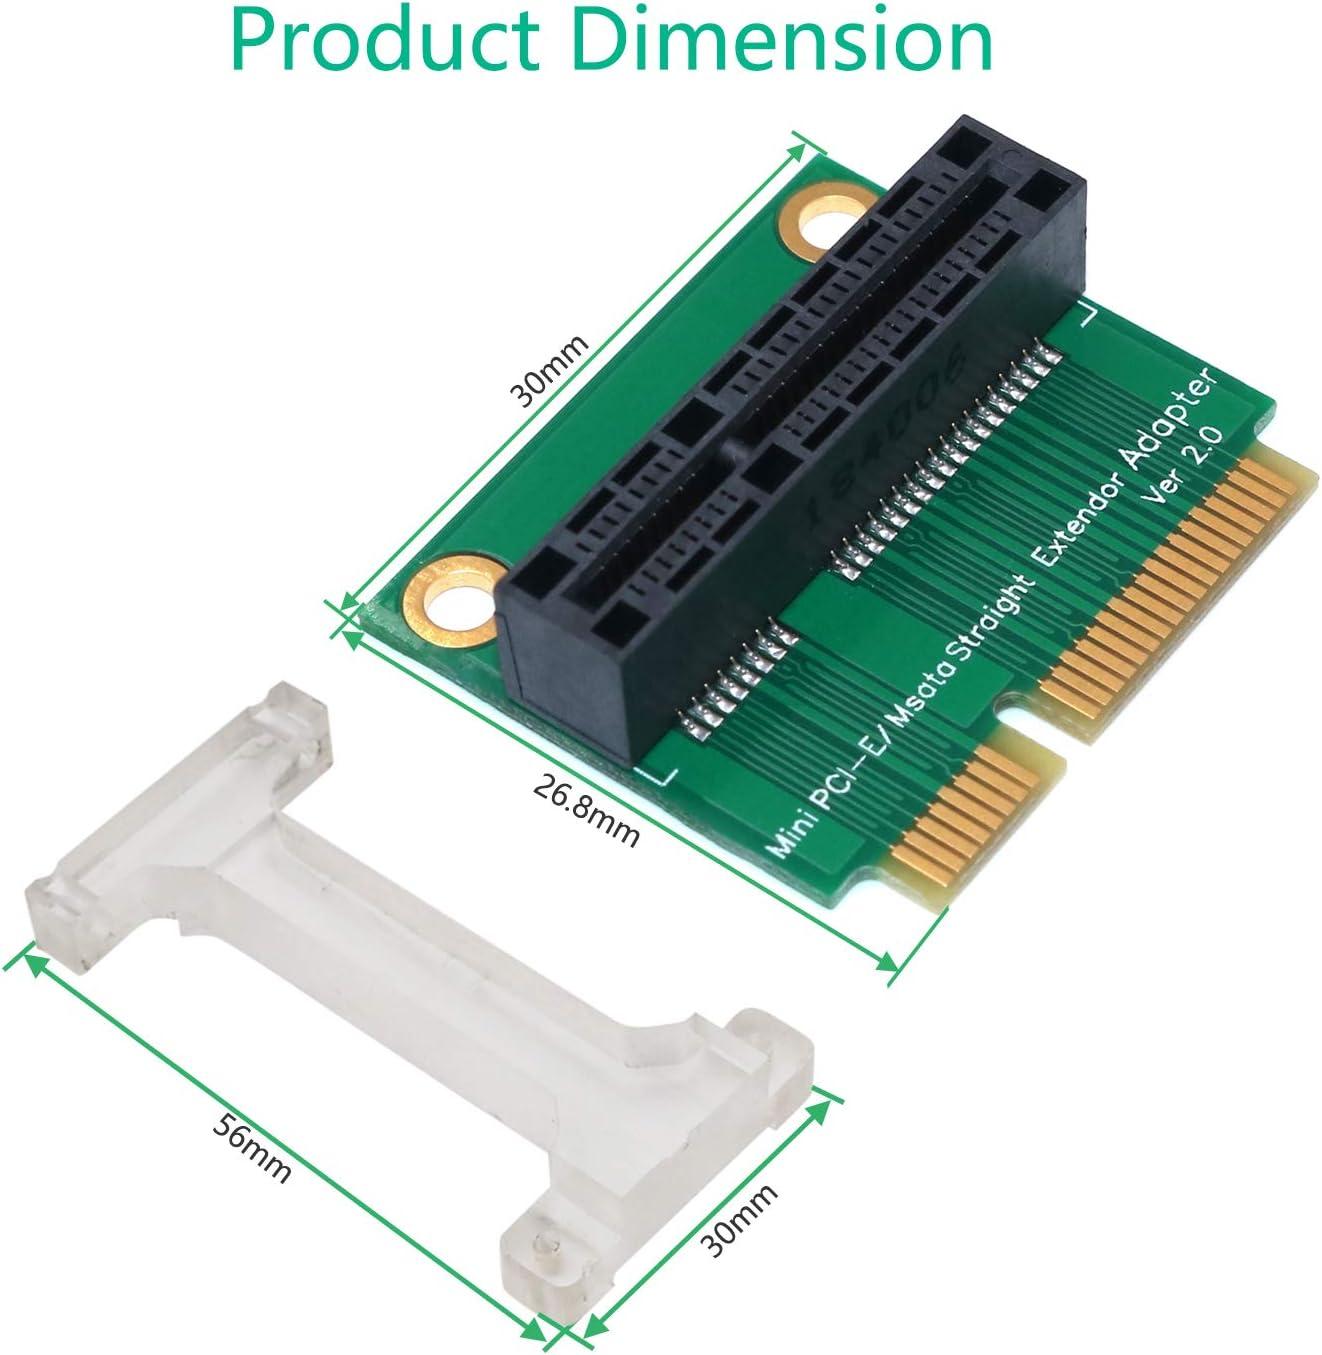 for 3G//4G Vertical Installation WWAN LTE,GPS and MSATA Card BQZYX+ Mini PCI-E//mSATA Adapter